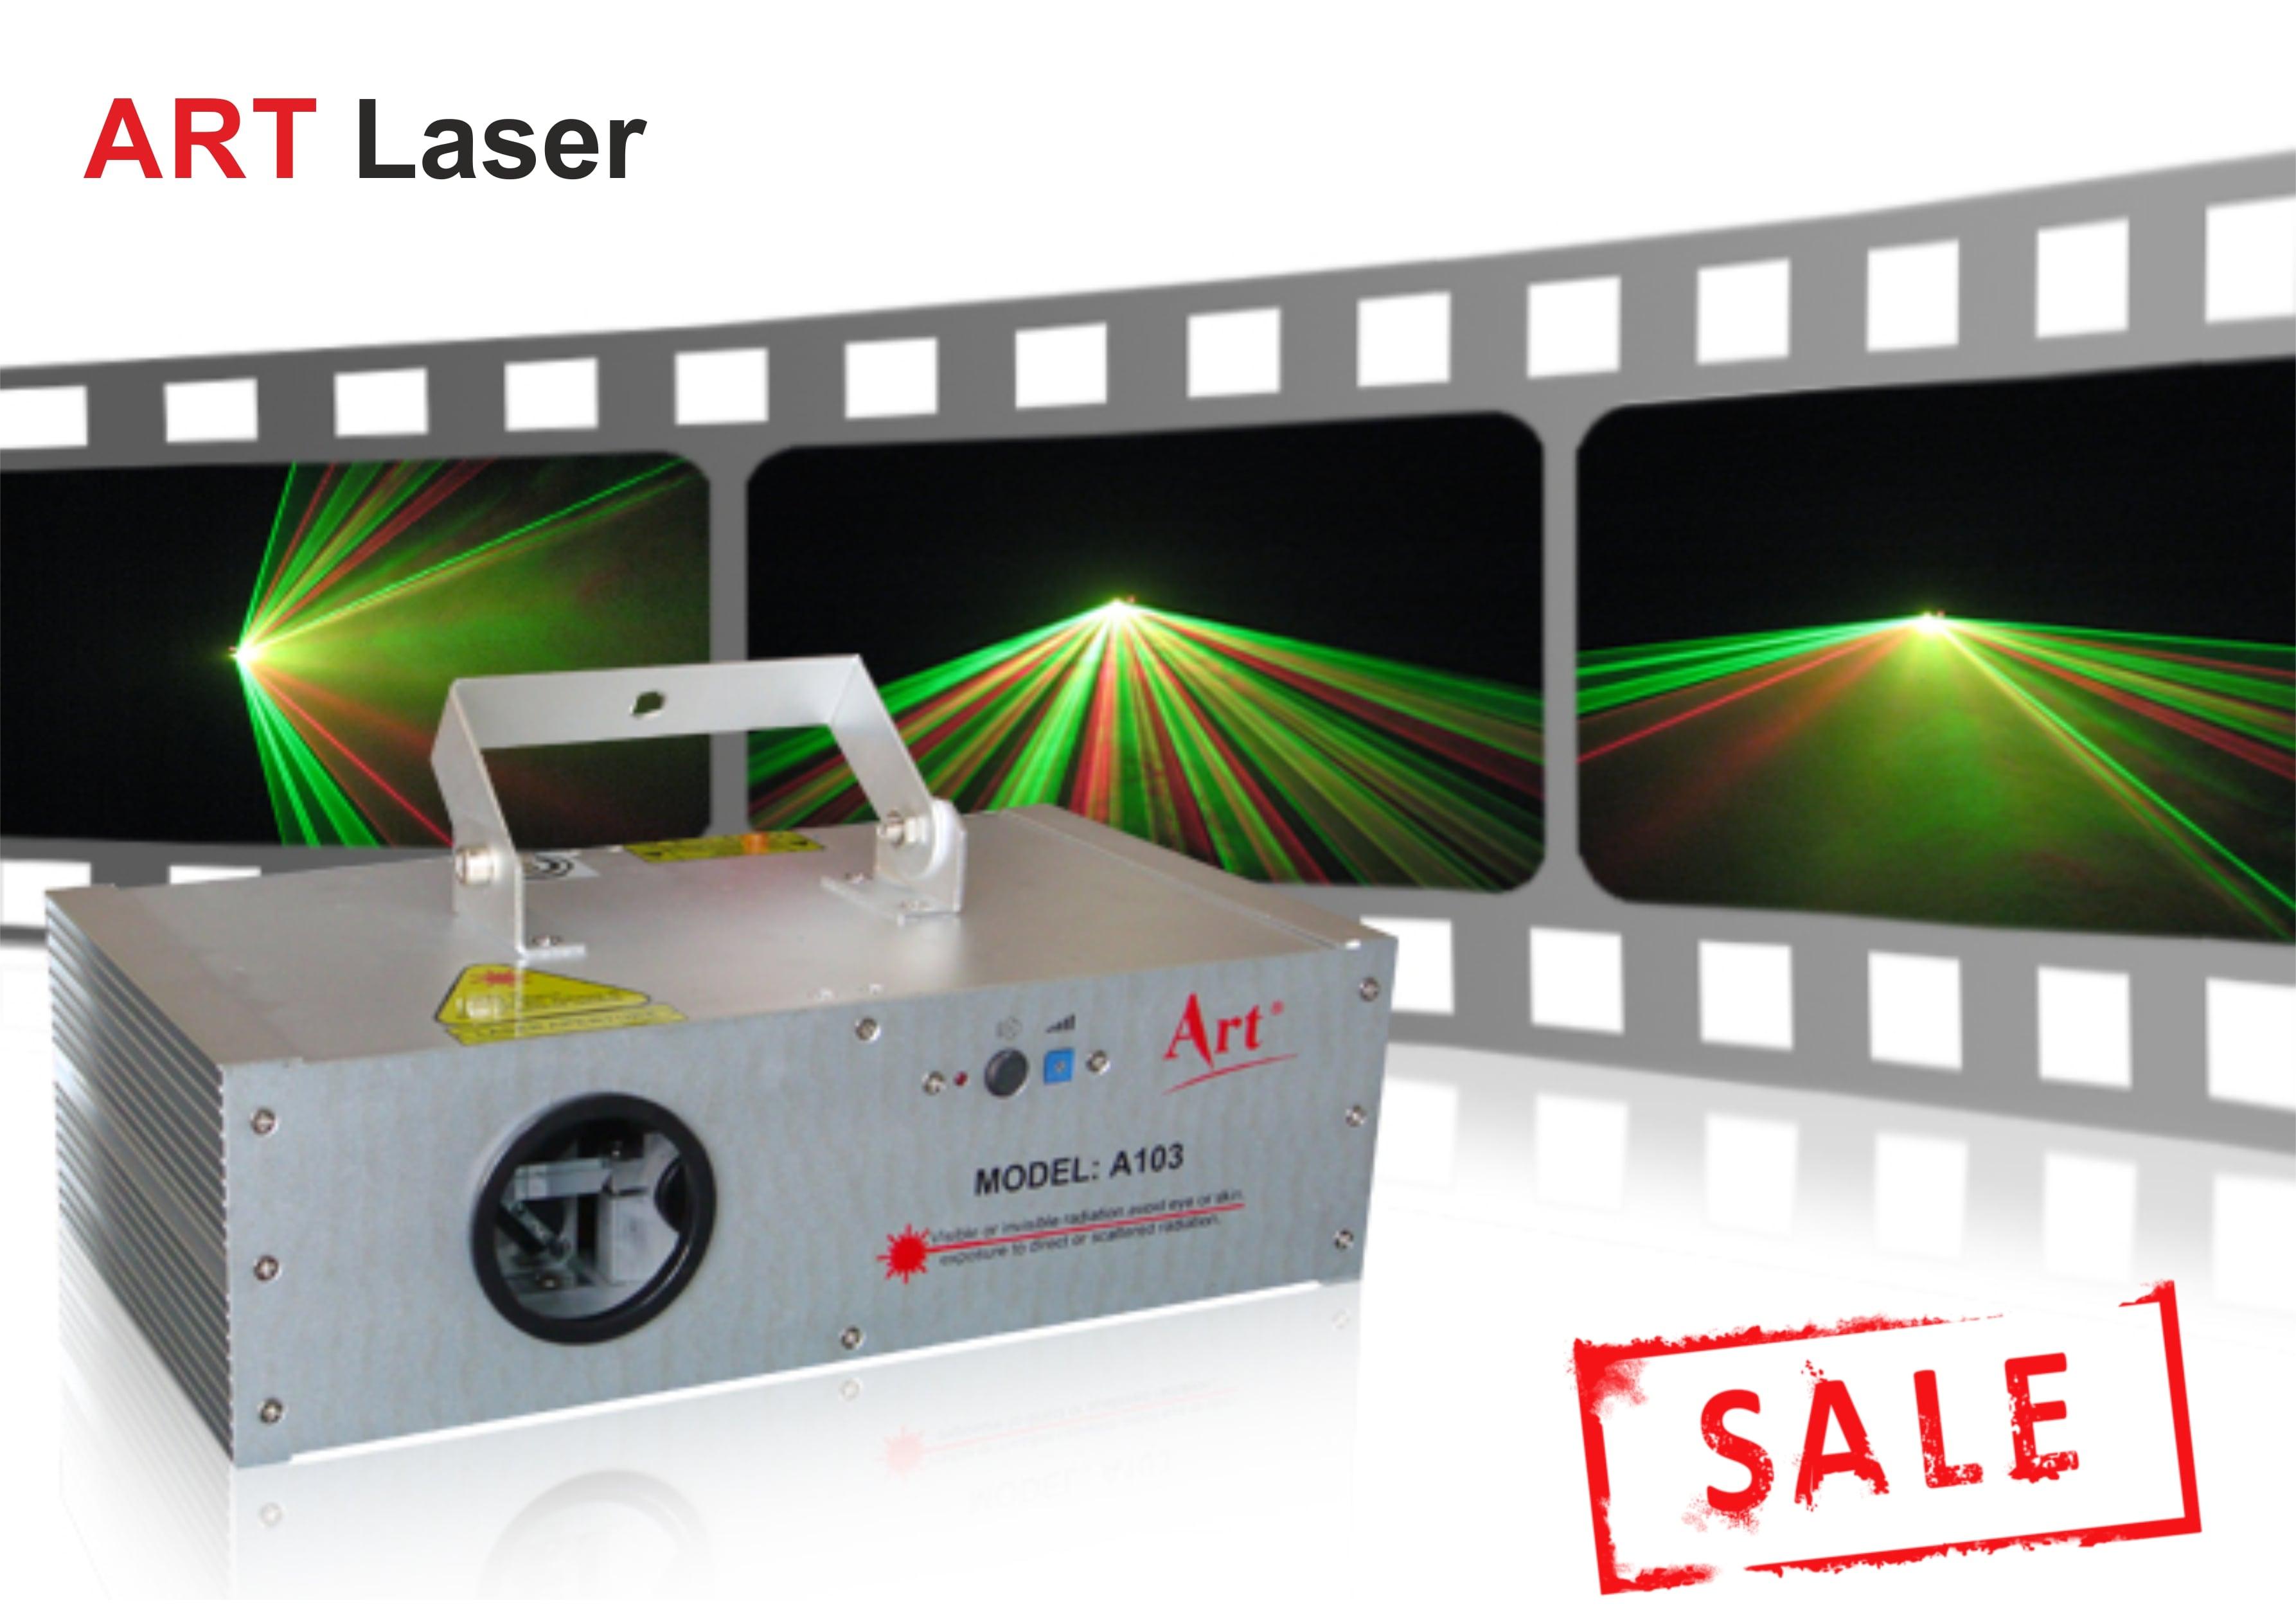 лазер купити